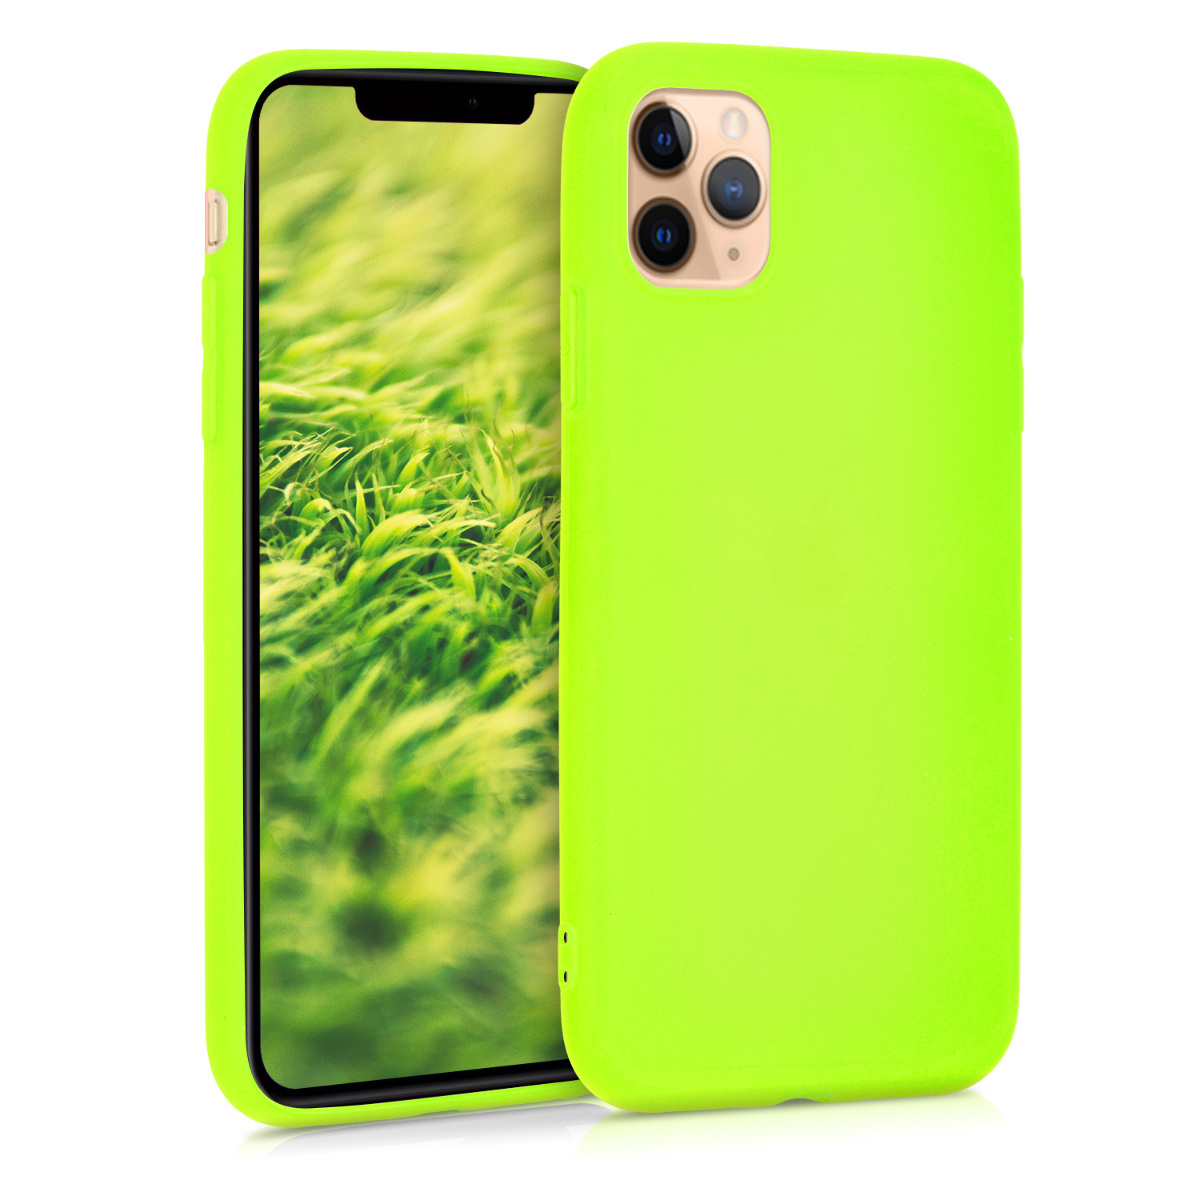 KW Θήκη Σιλικόνης Apple iPhone 11 Pro Max - Neon Yellow (49782.75)